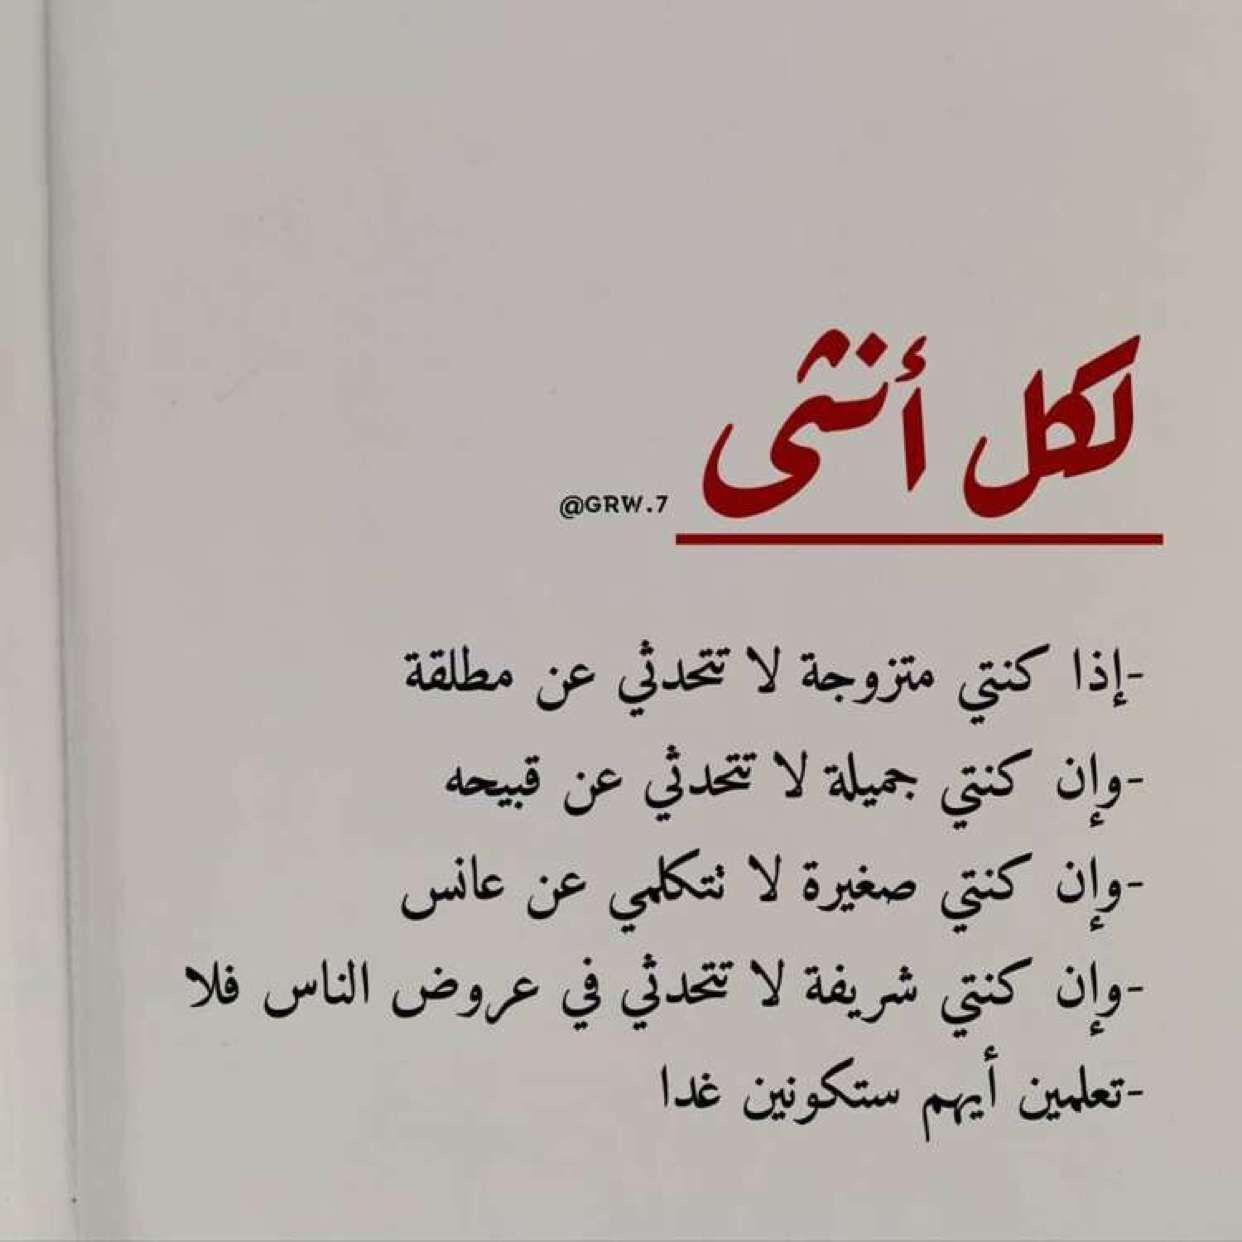 درس لاي شخص سواء رجل او انثى Words Quotes Feelings Words Quotations